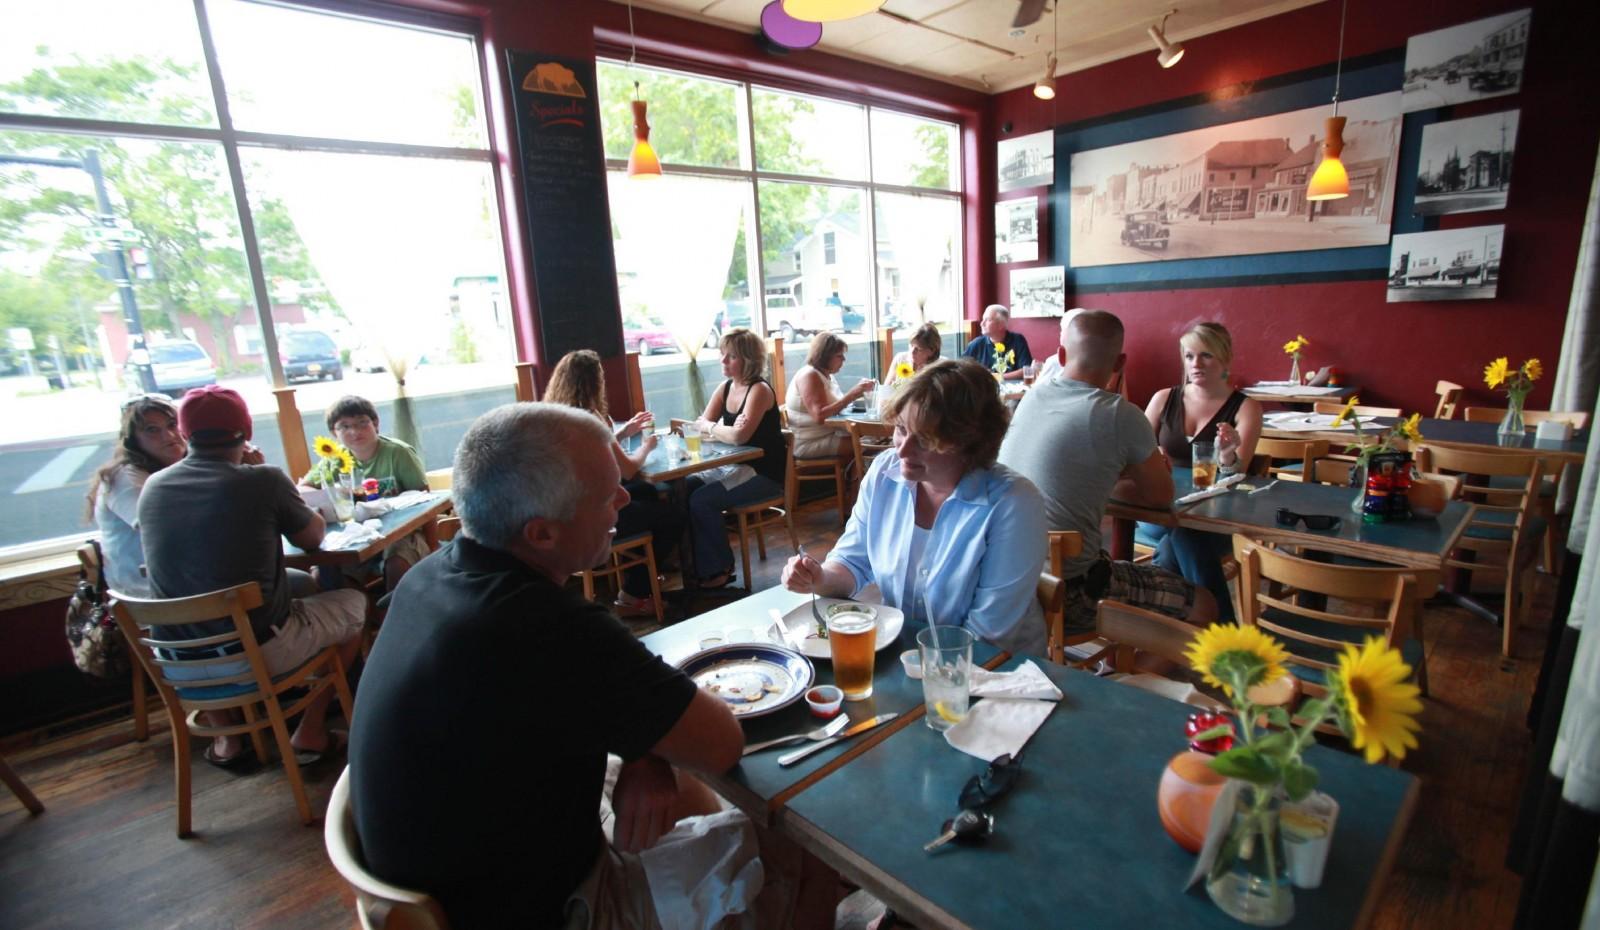 Buffalo Street Grill is heading upscale, to become Carte Blanche. (Sharon Cantillon/Buffalo News)